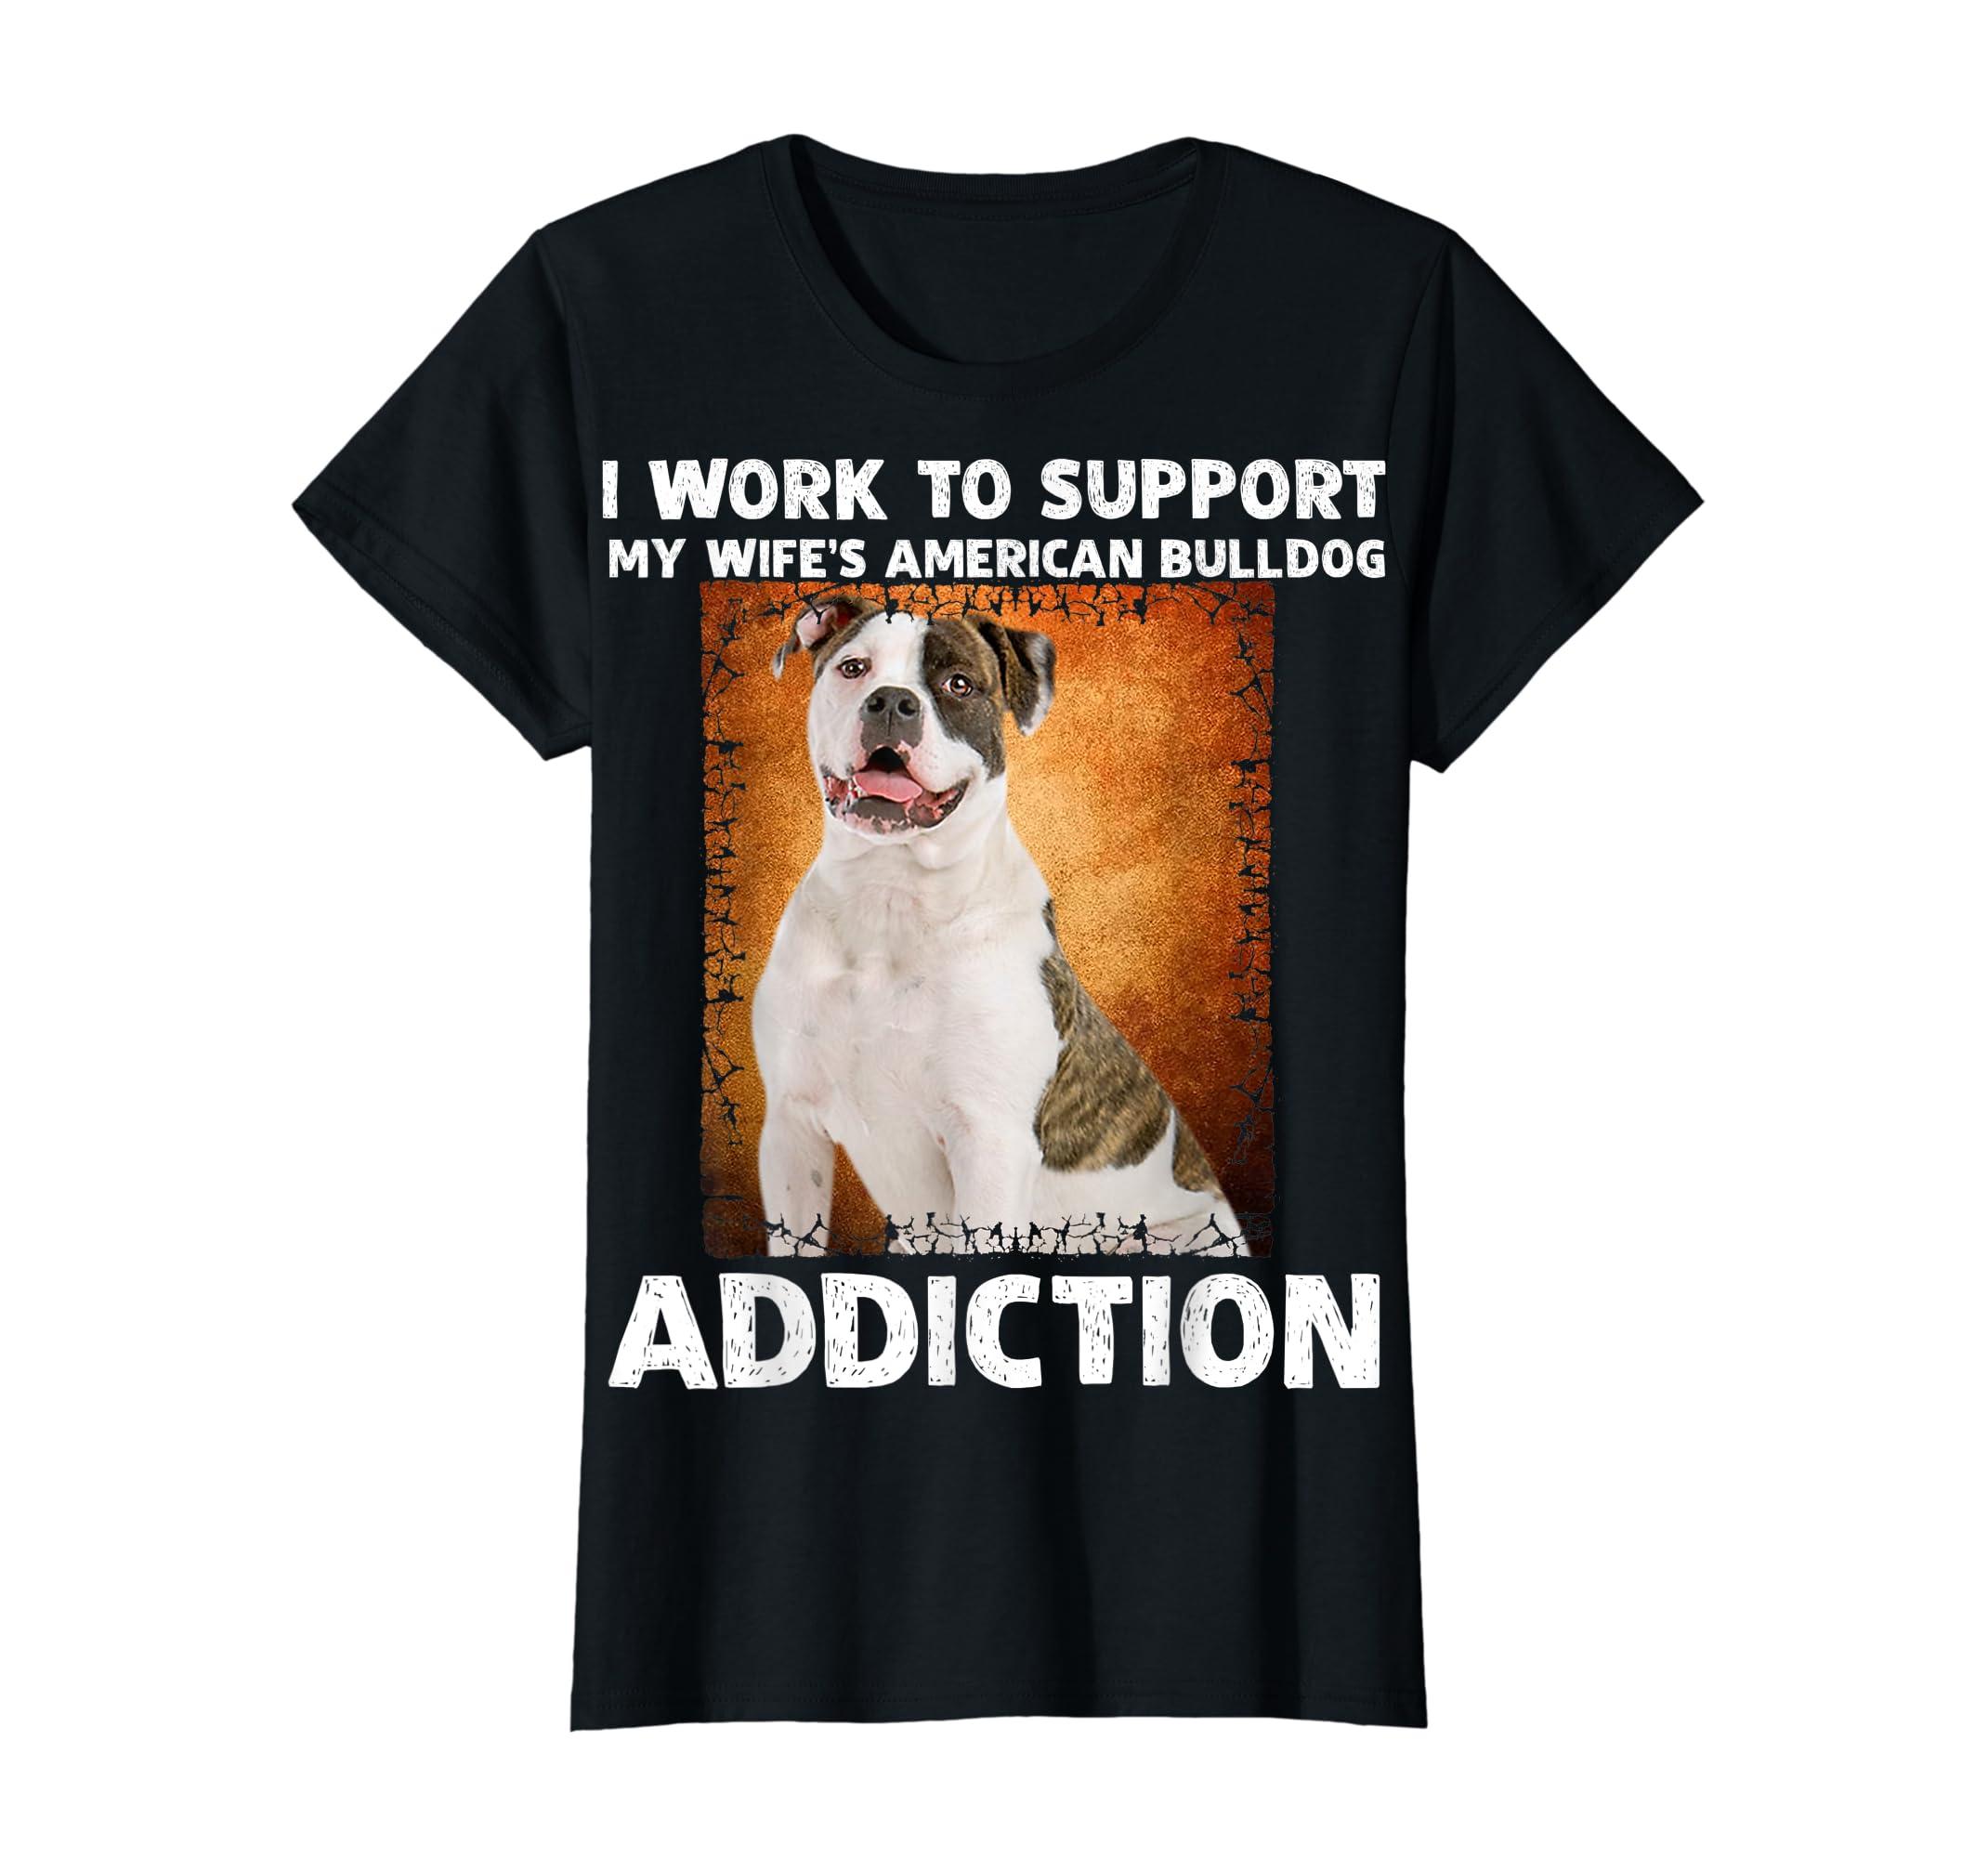 I Support My Wife American bulldog Addiction T-Shirt-Women's T-Shirt-Black